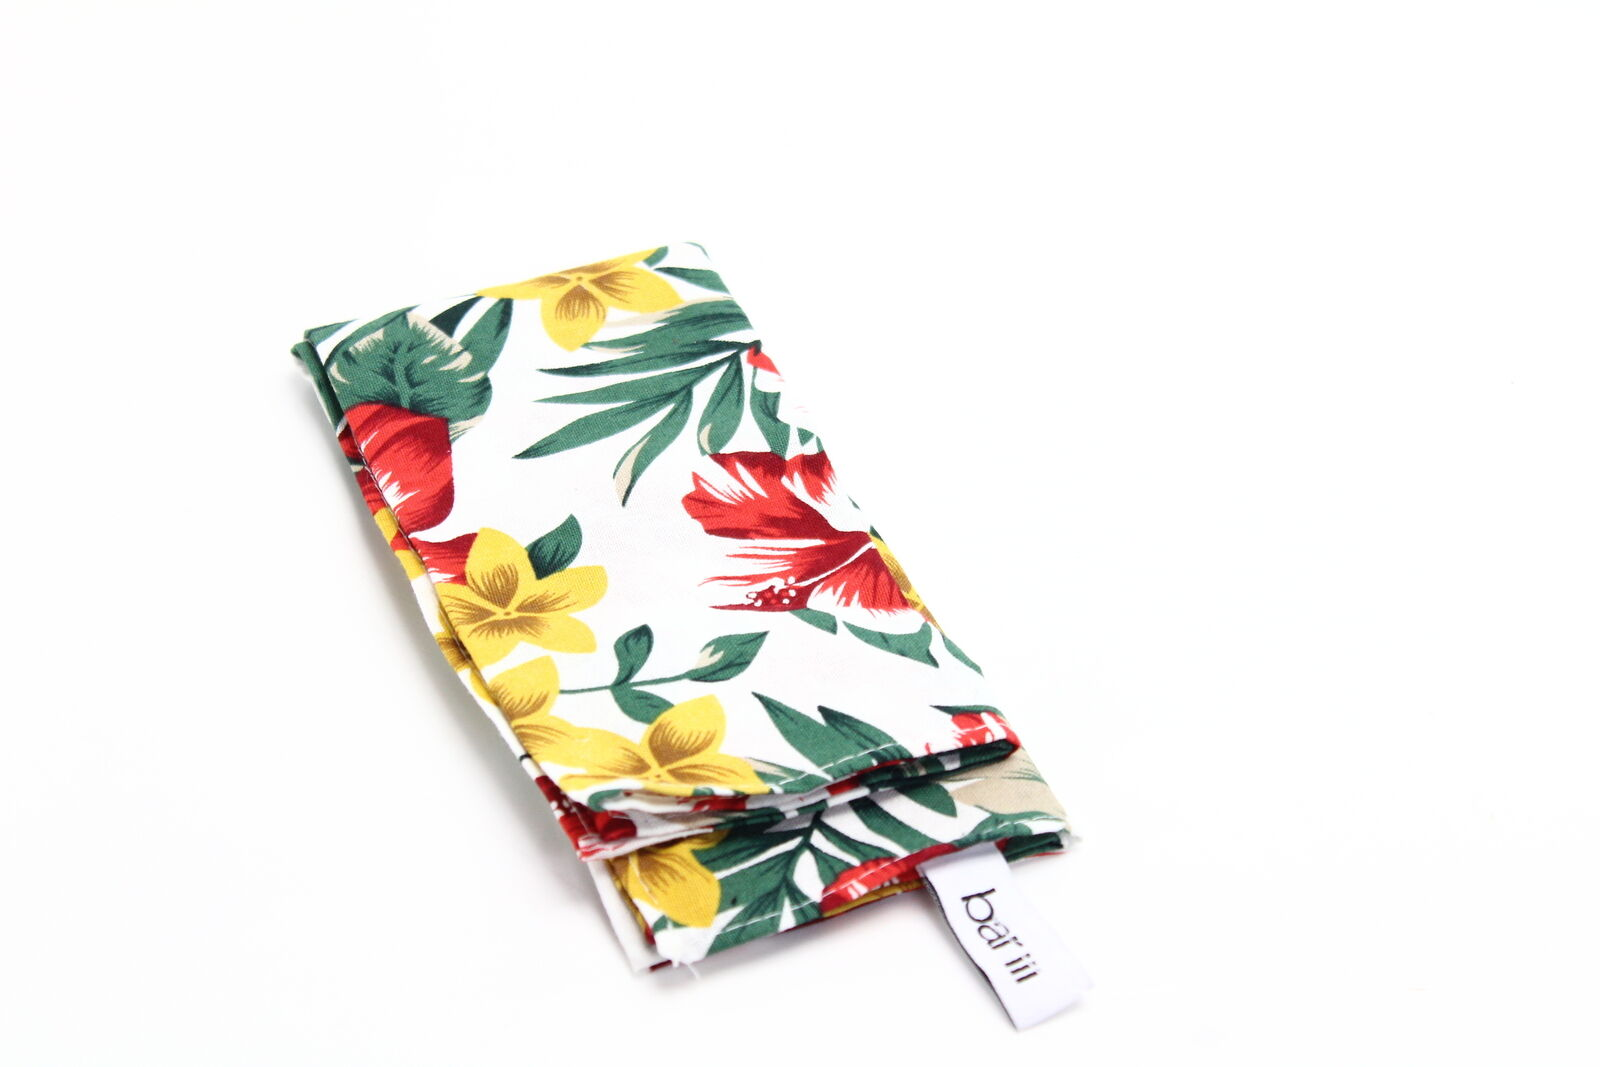 Bar III Men's Pocket Square White Leaf Floral Patterned Accessory - 406